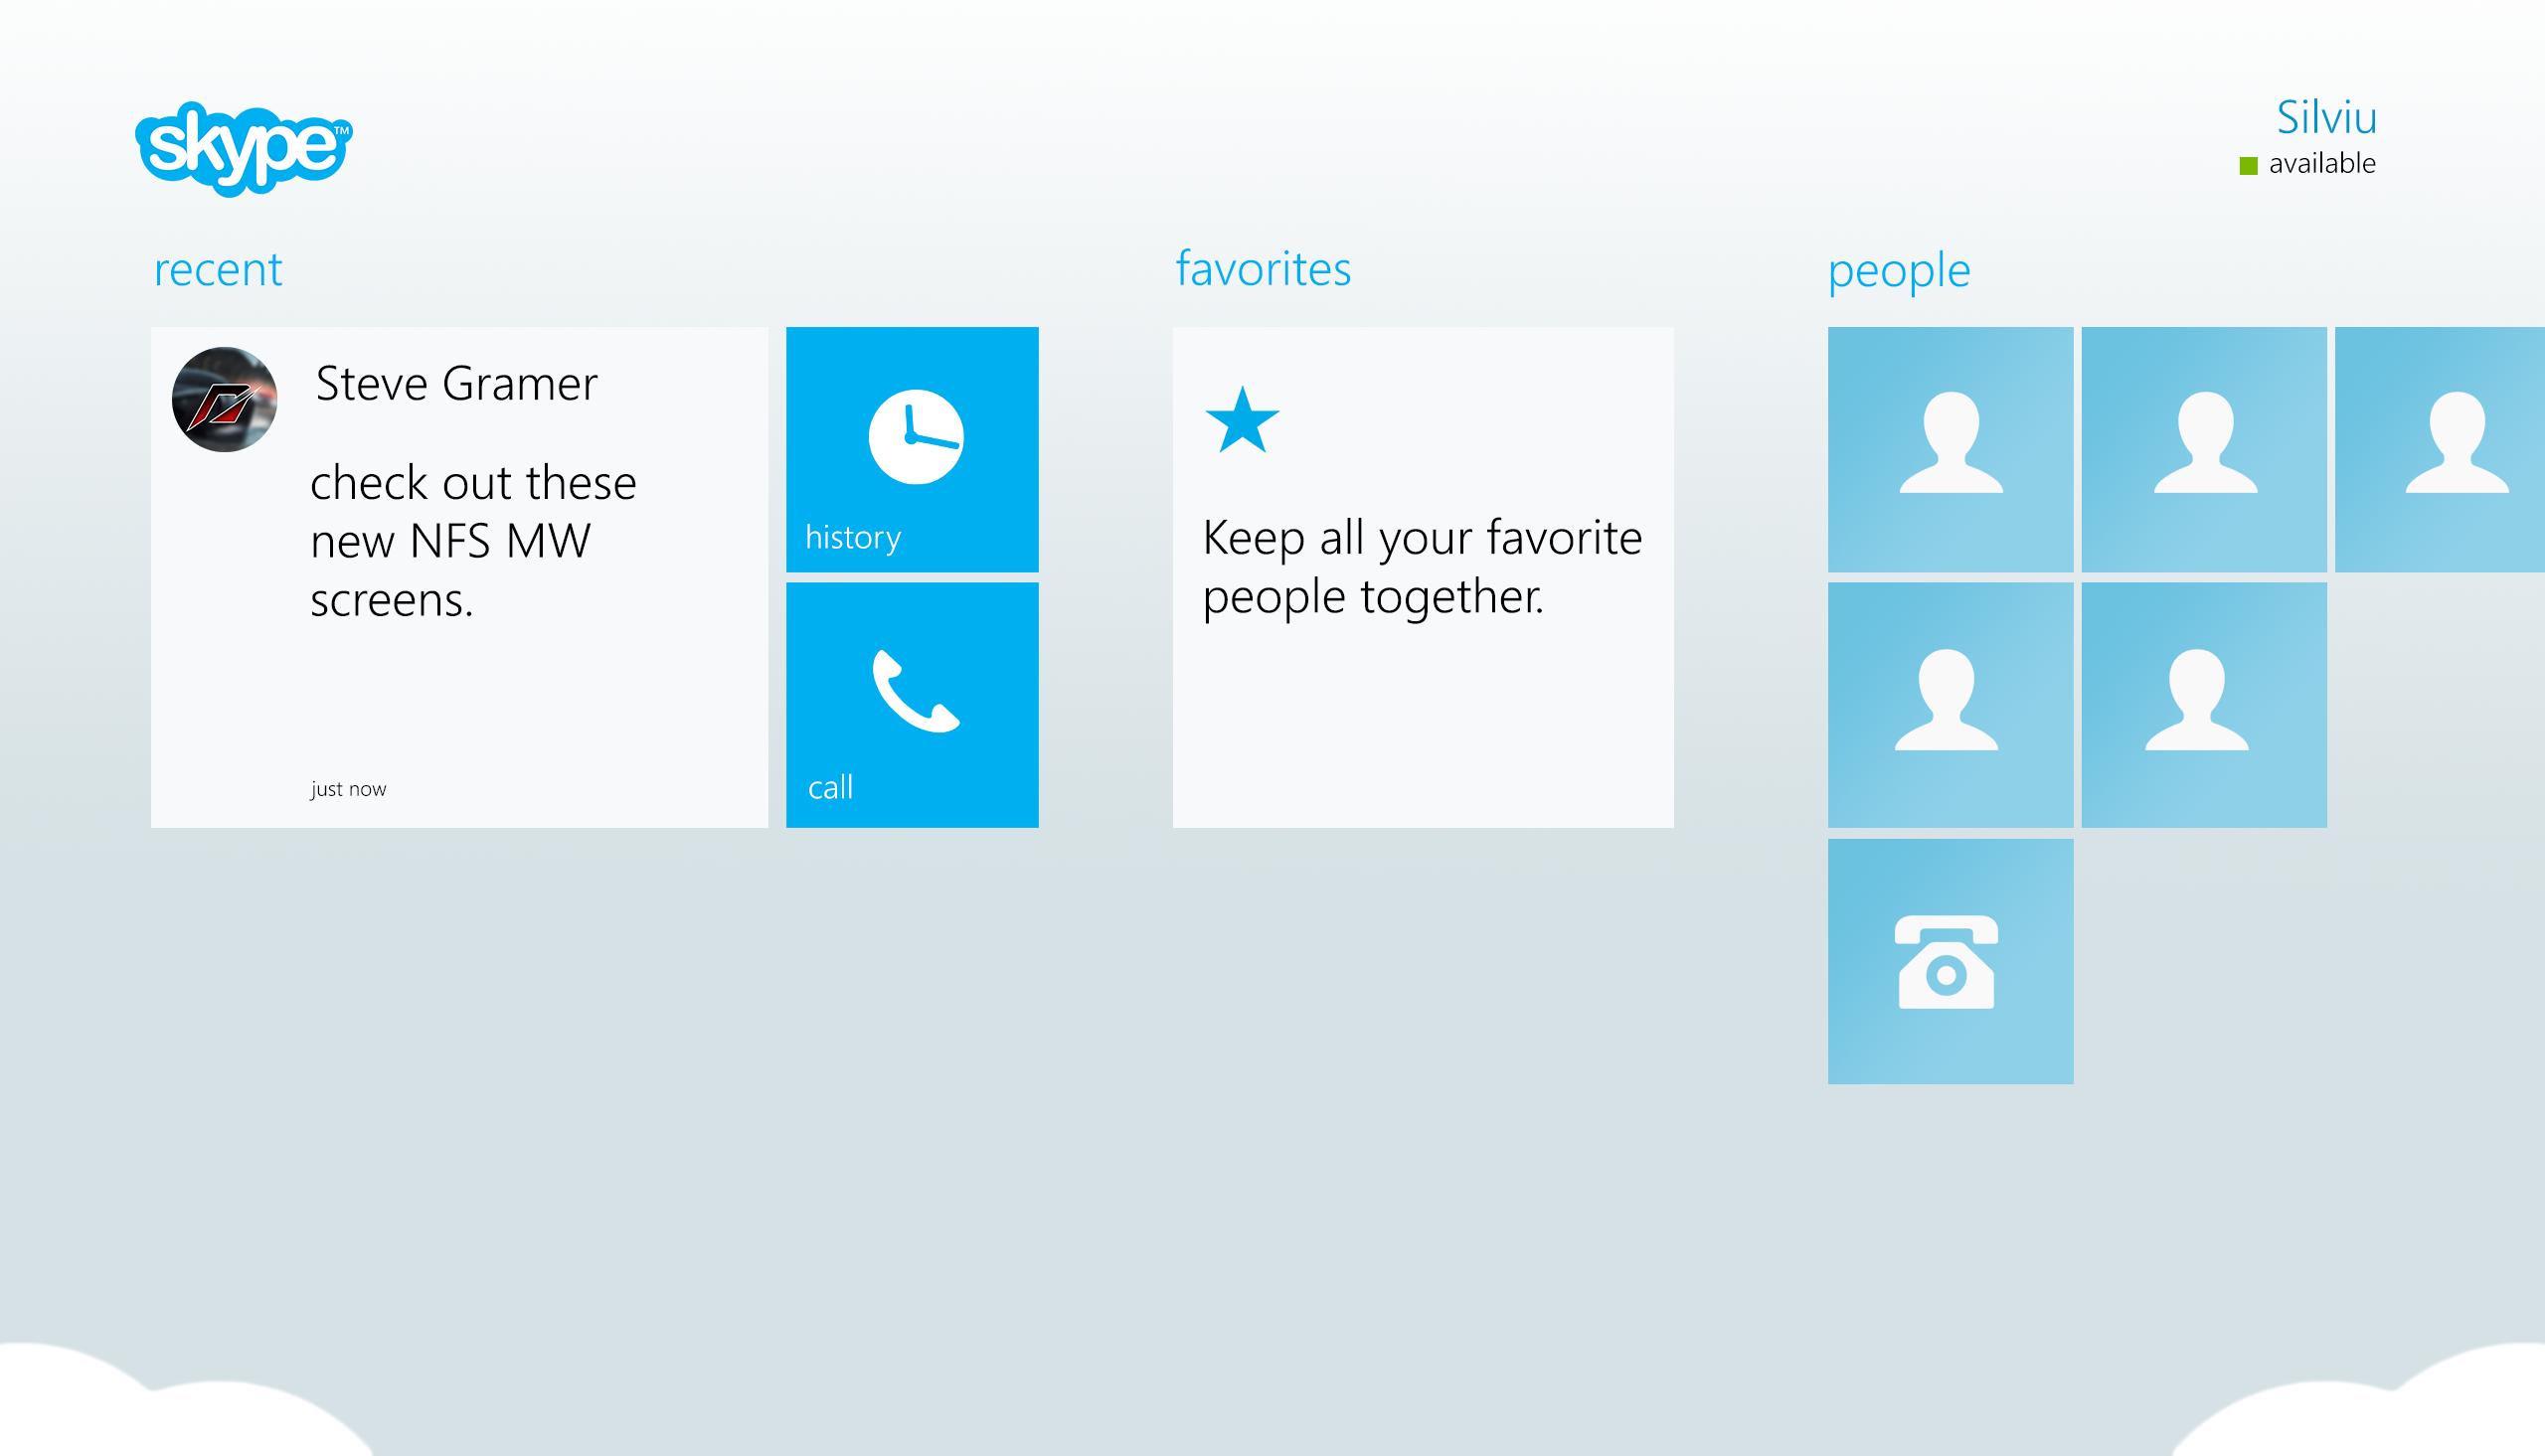 Skype for Modern UI by Brebenel-Silviu